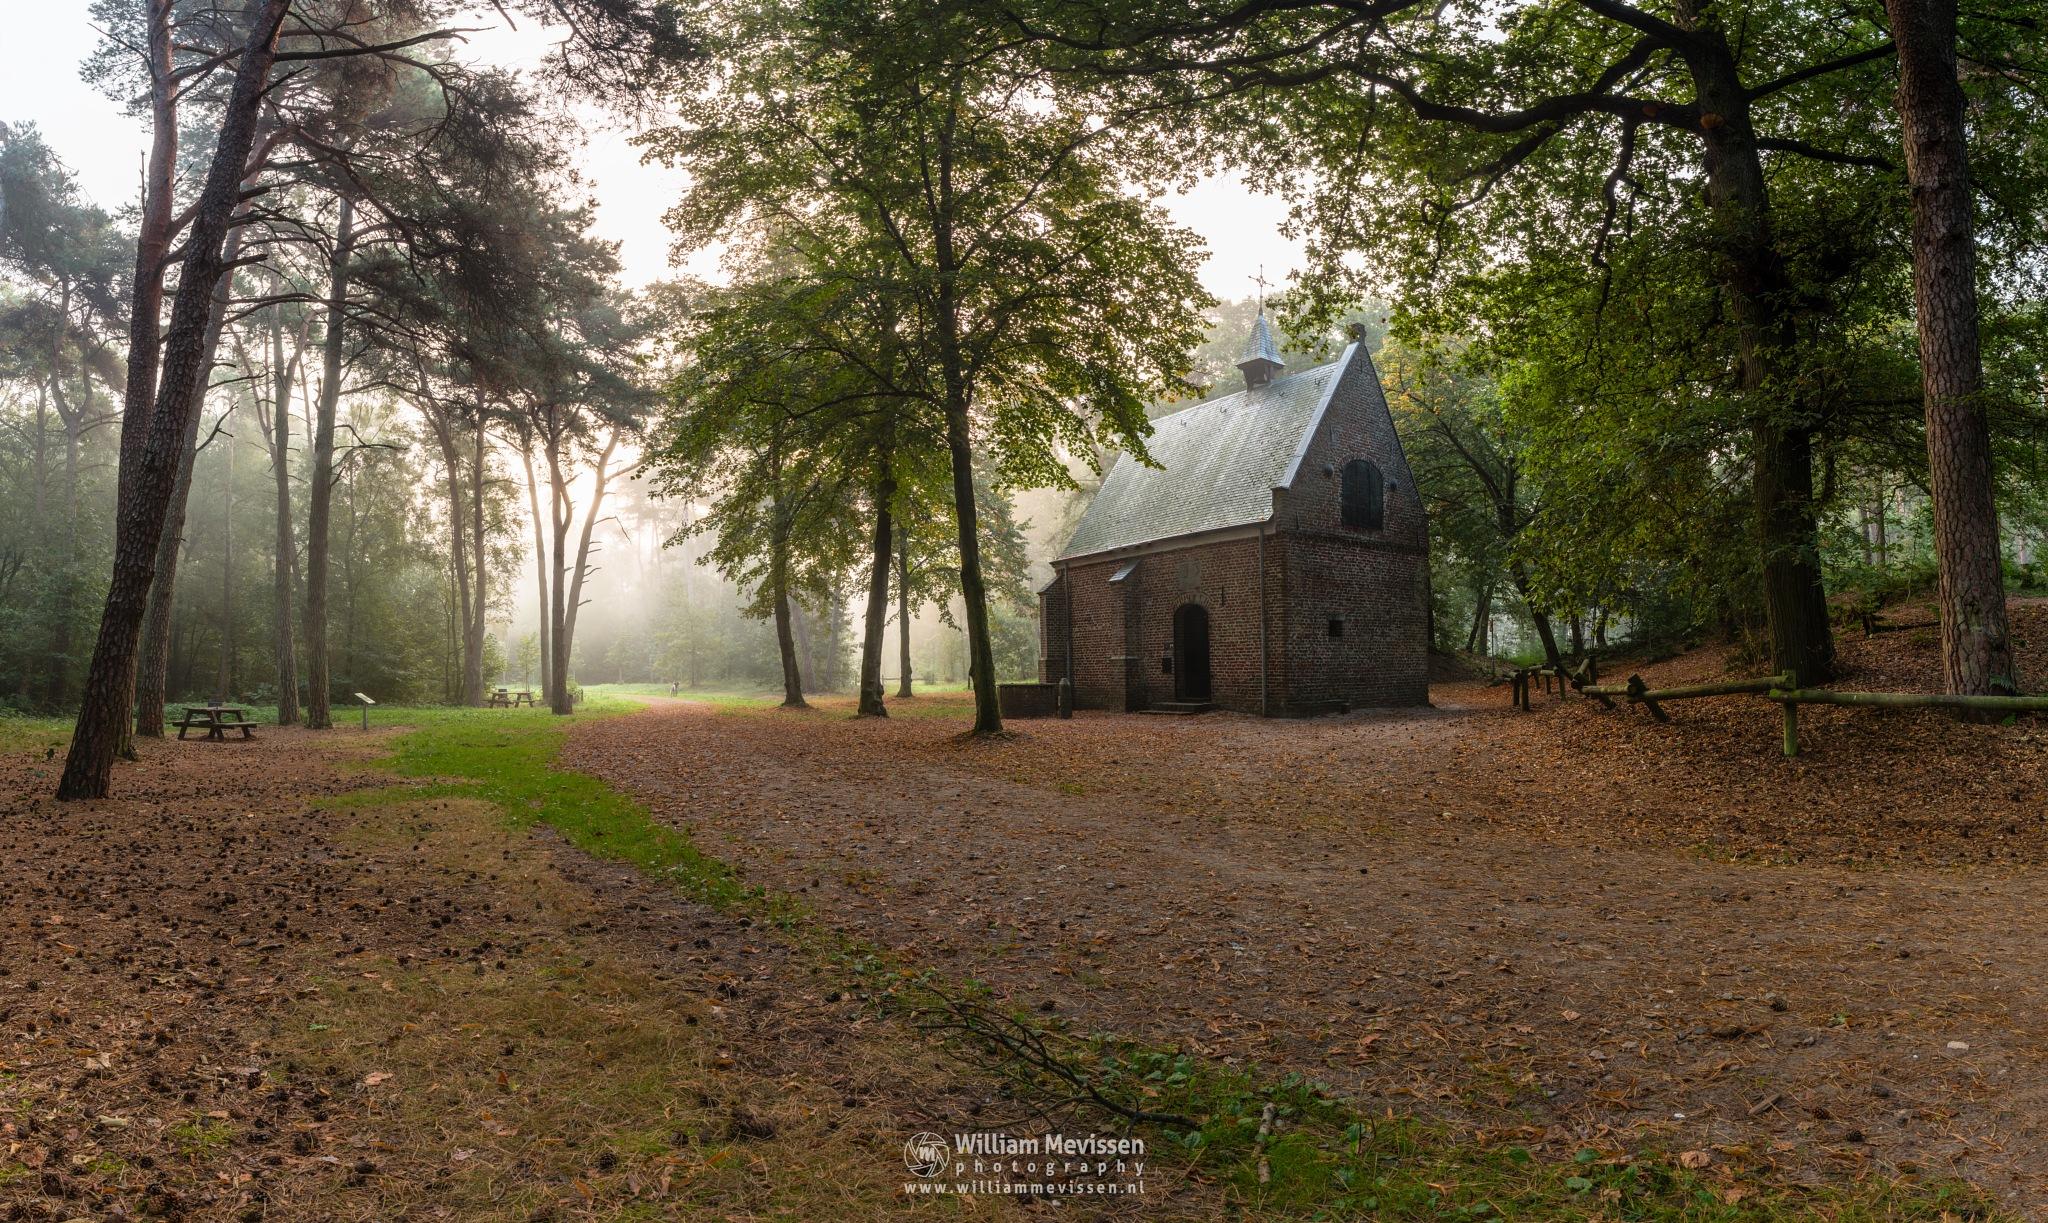 Panorama - Willibrorduskapel by William Mevissen